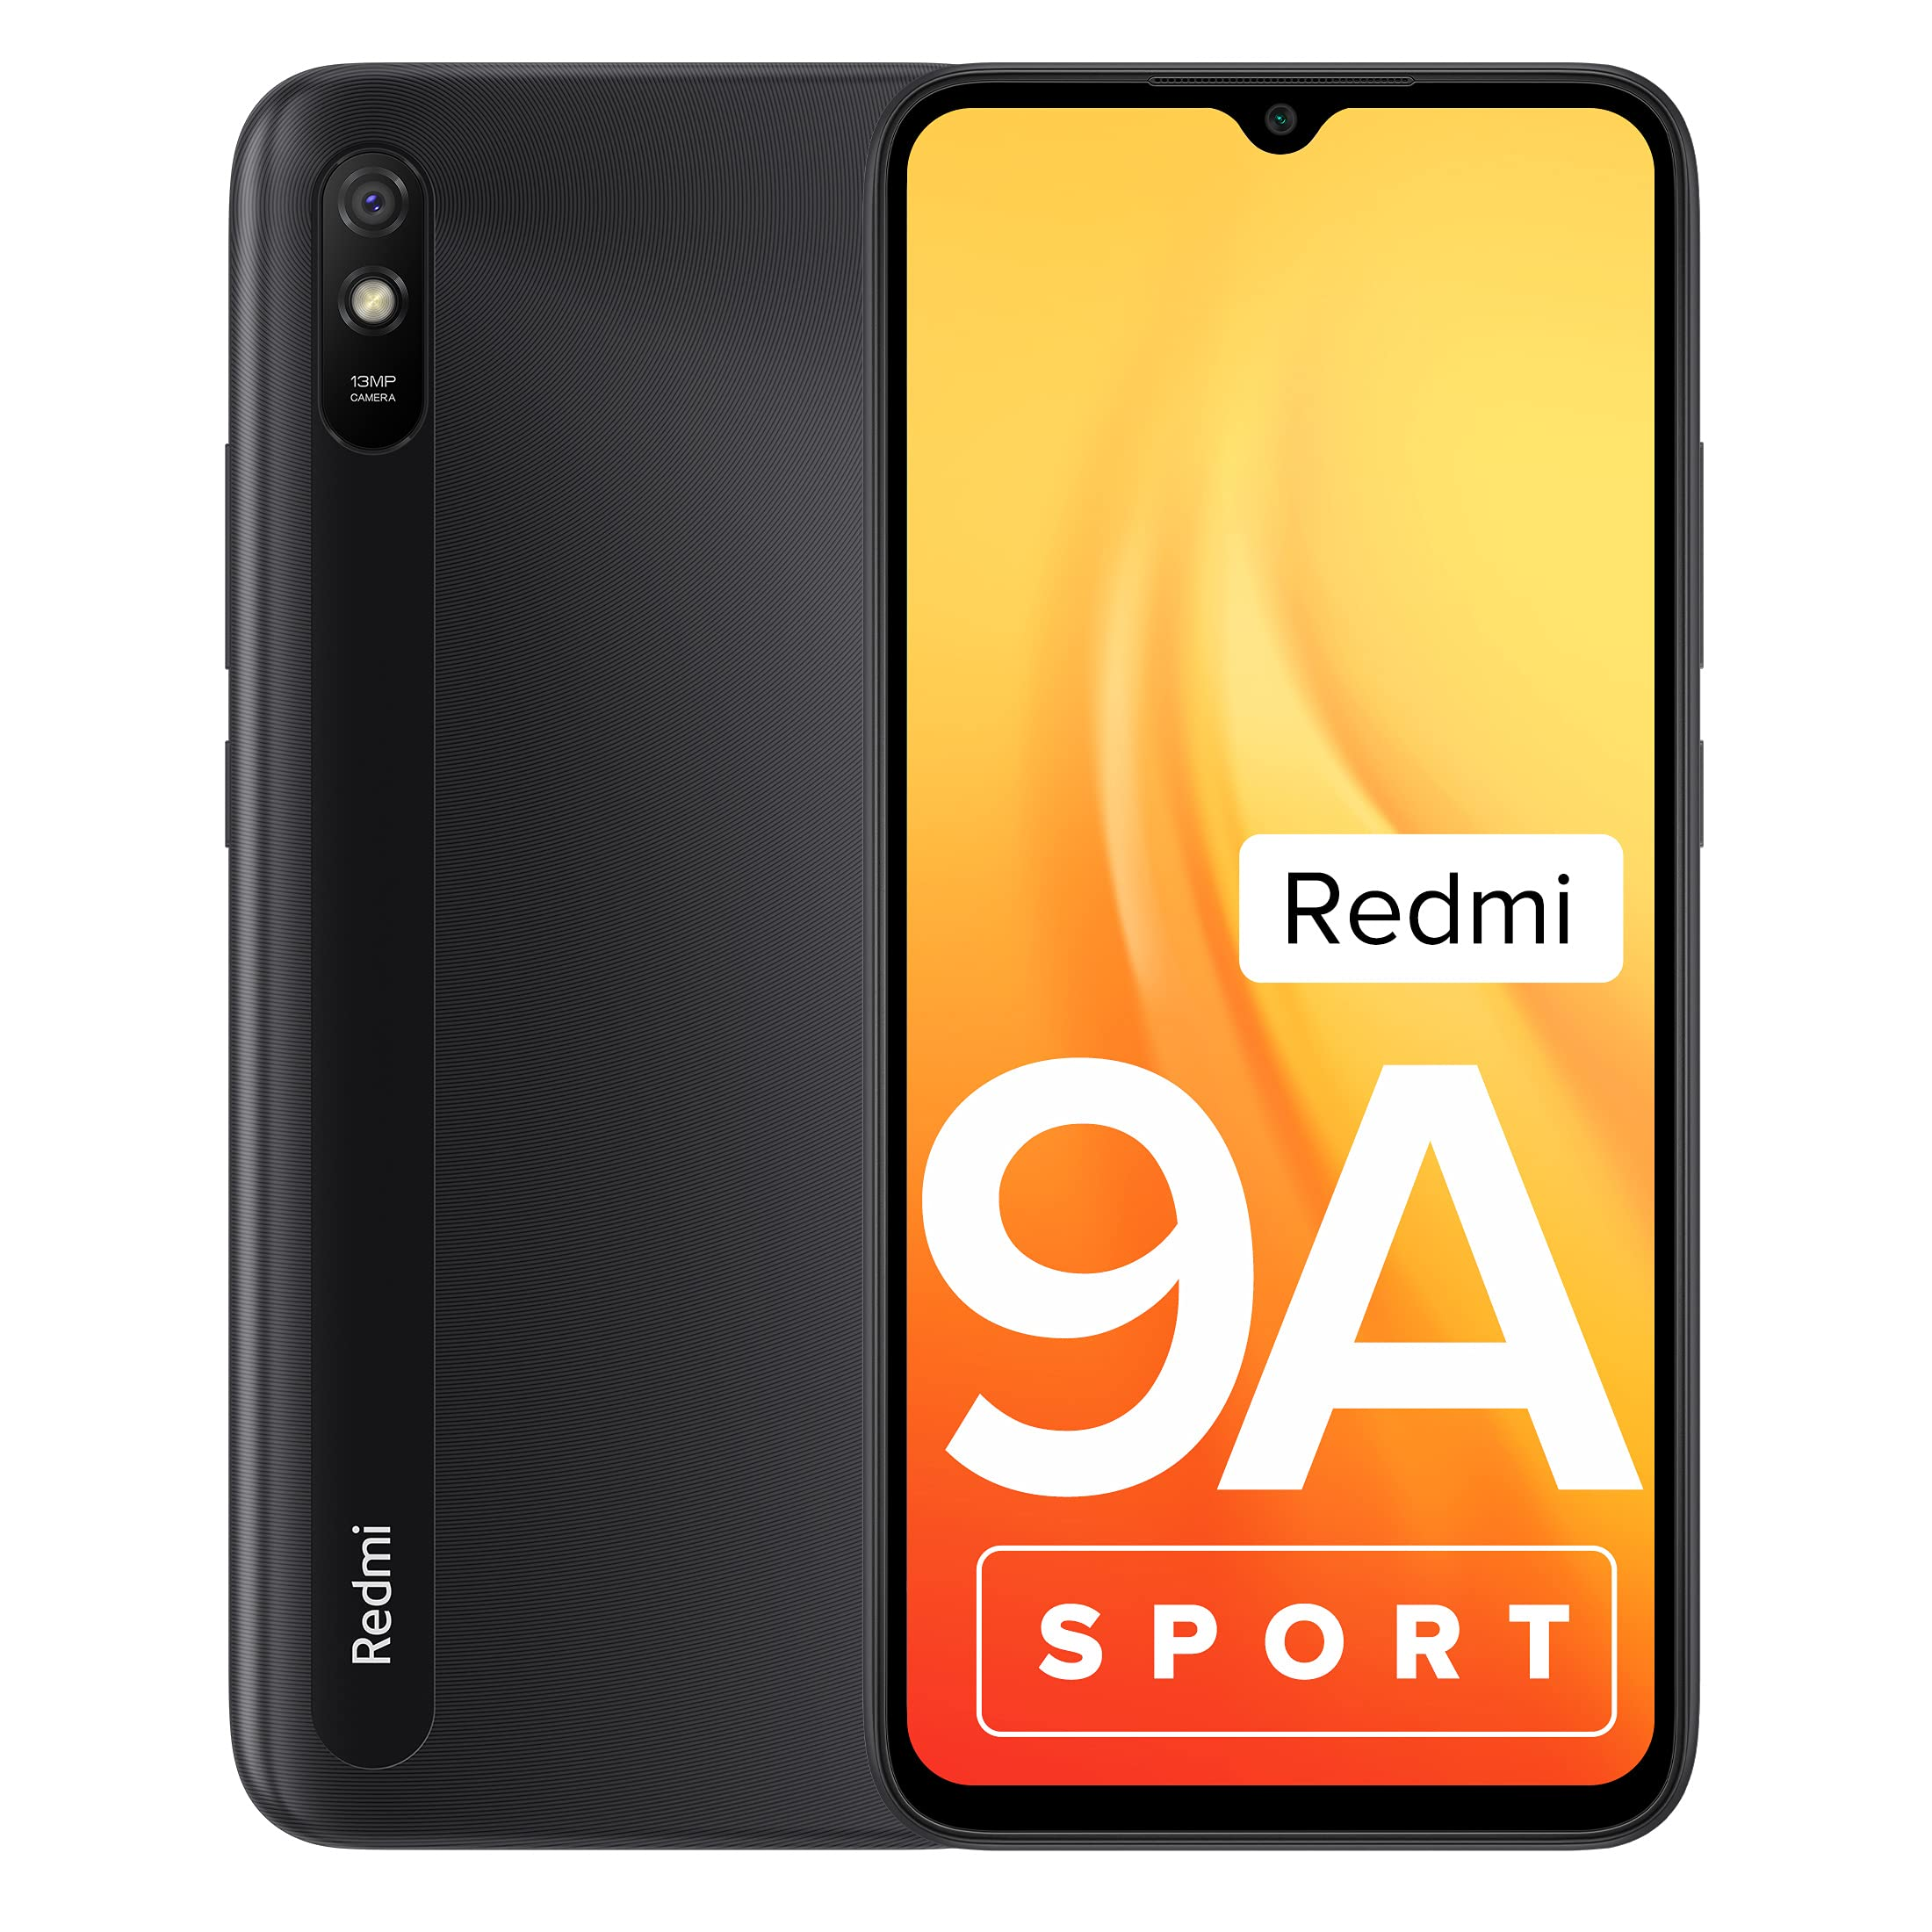 Redmi 9A Sport (Carbon Black, 2GB RAM, 32GB Storage)